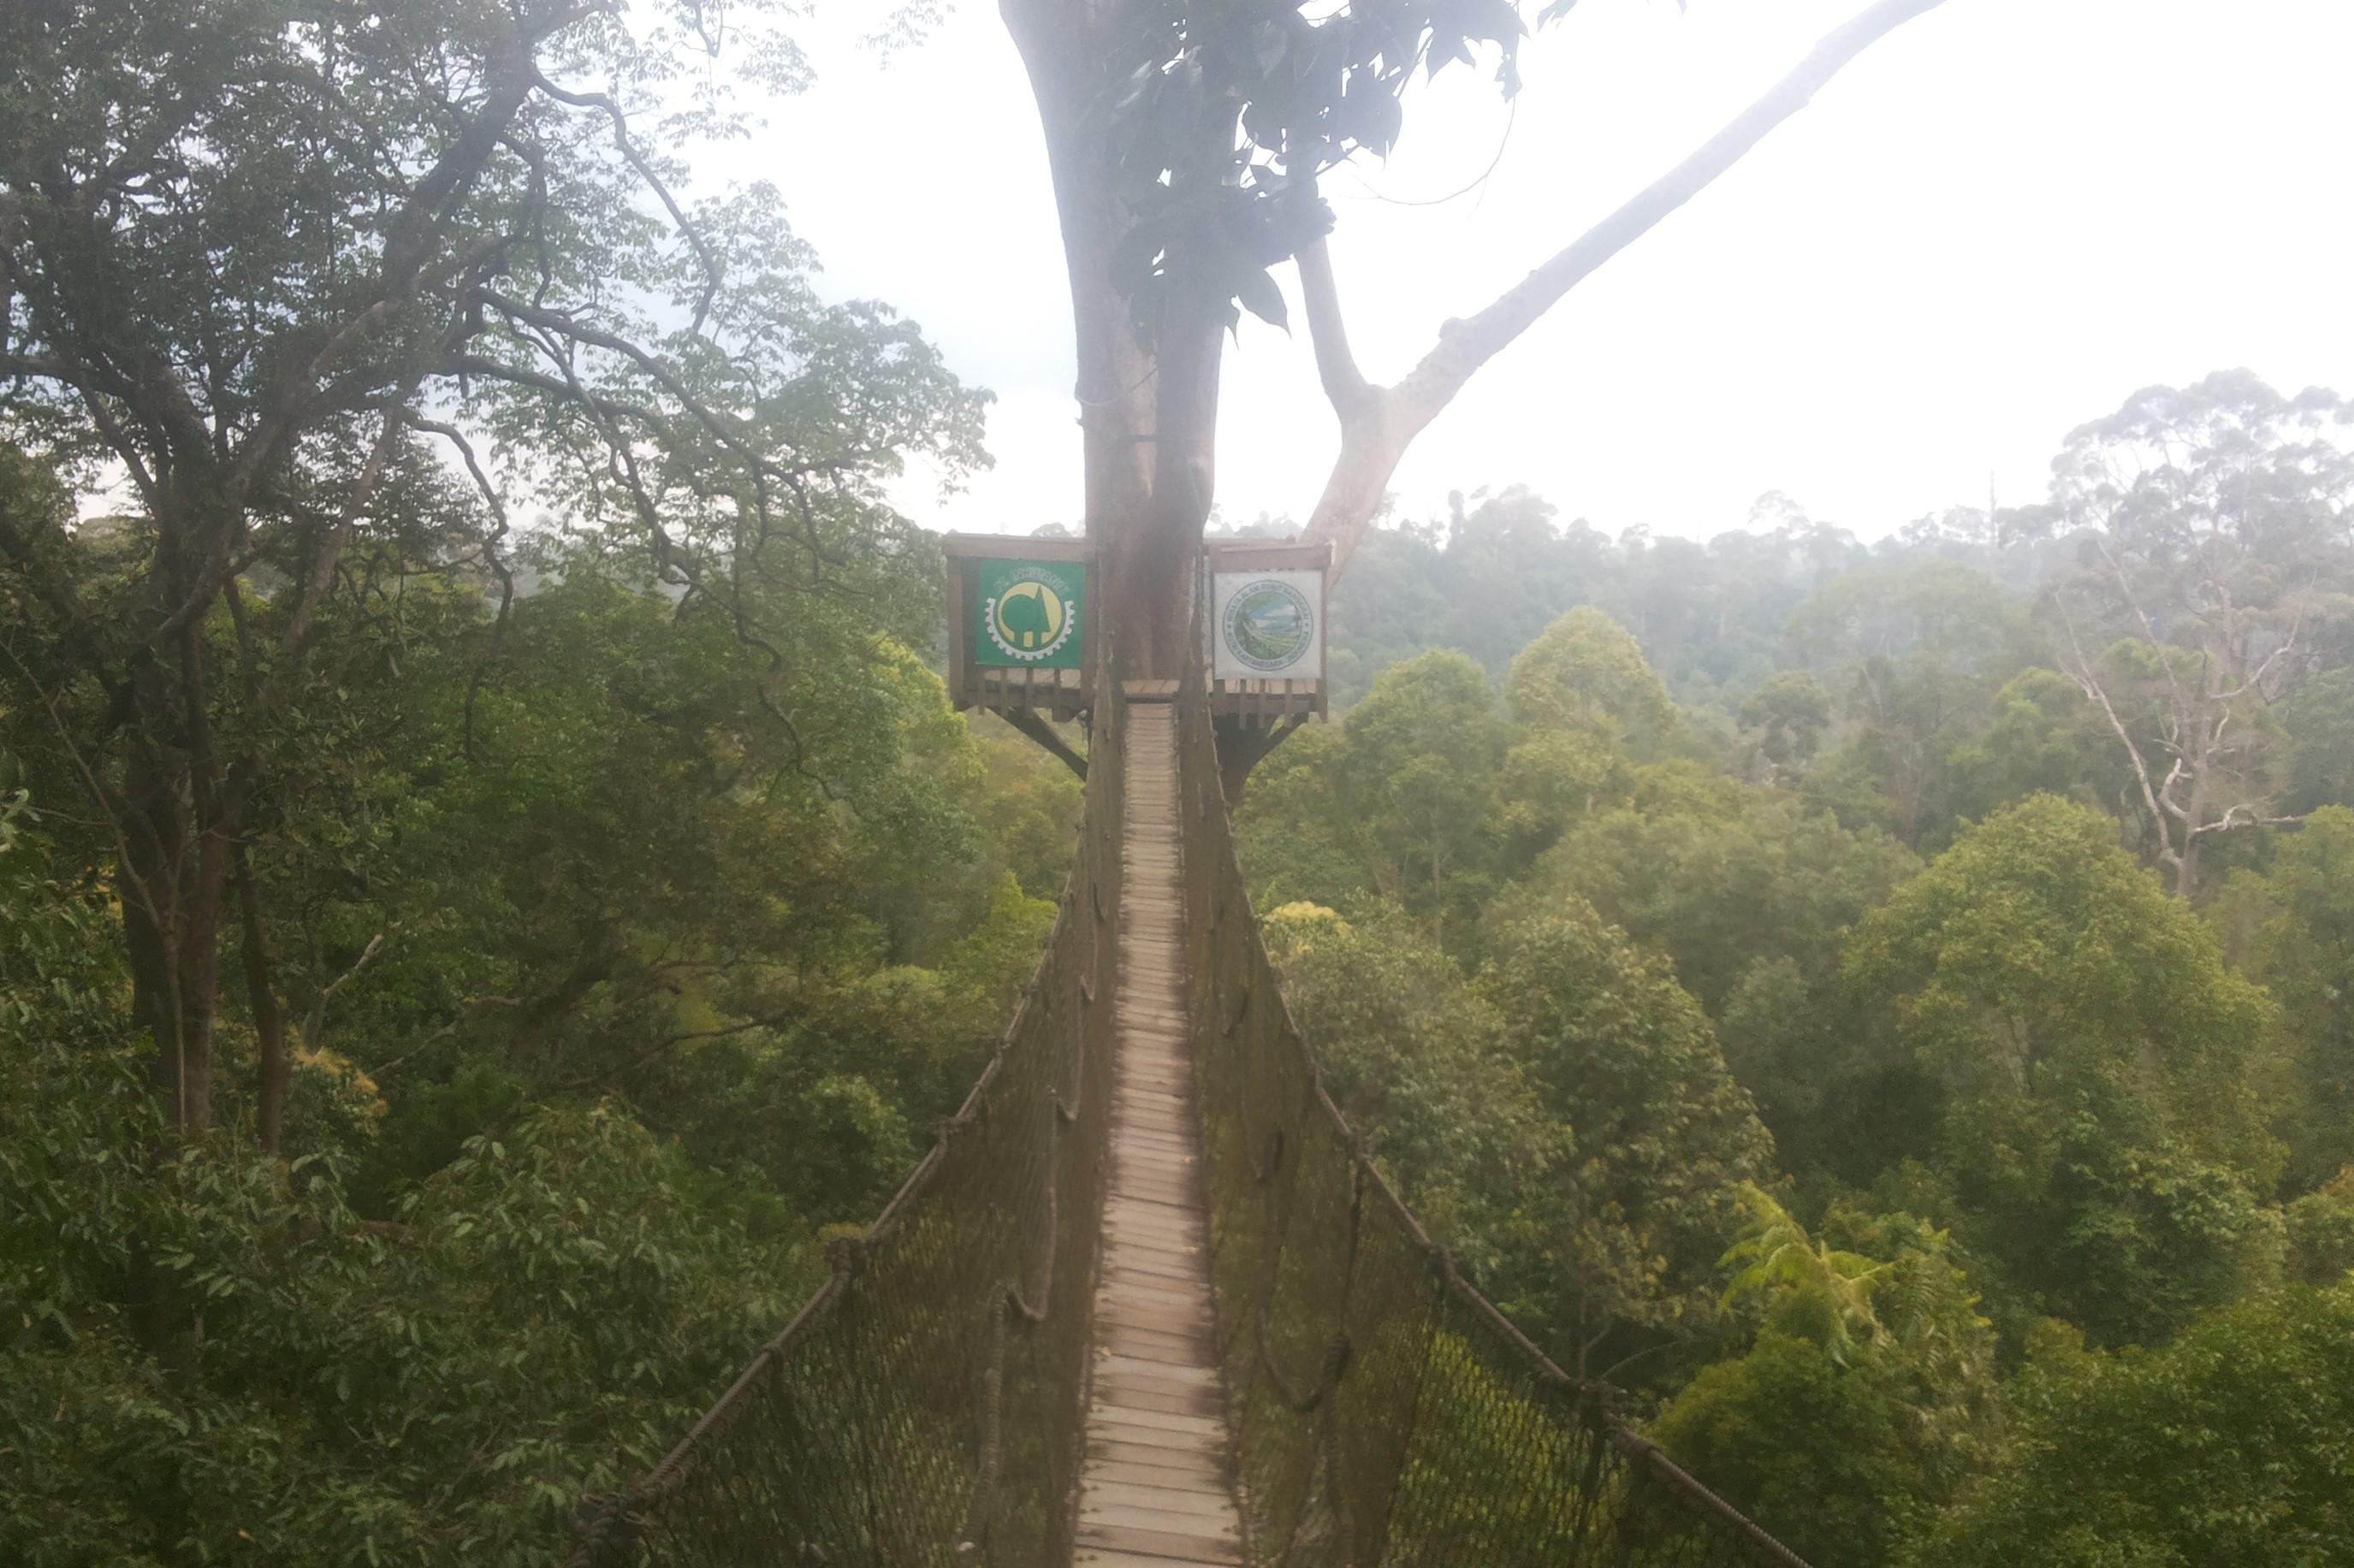 balikpapan orangutan bukit bankirai jungle samboja rain forest, proboscis monkey sail mangrove forest borneo tours